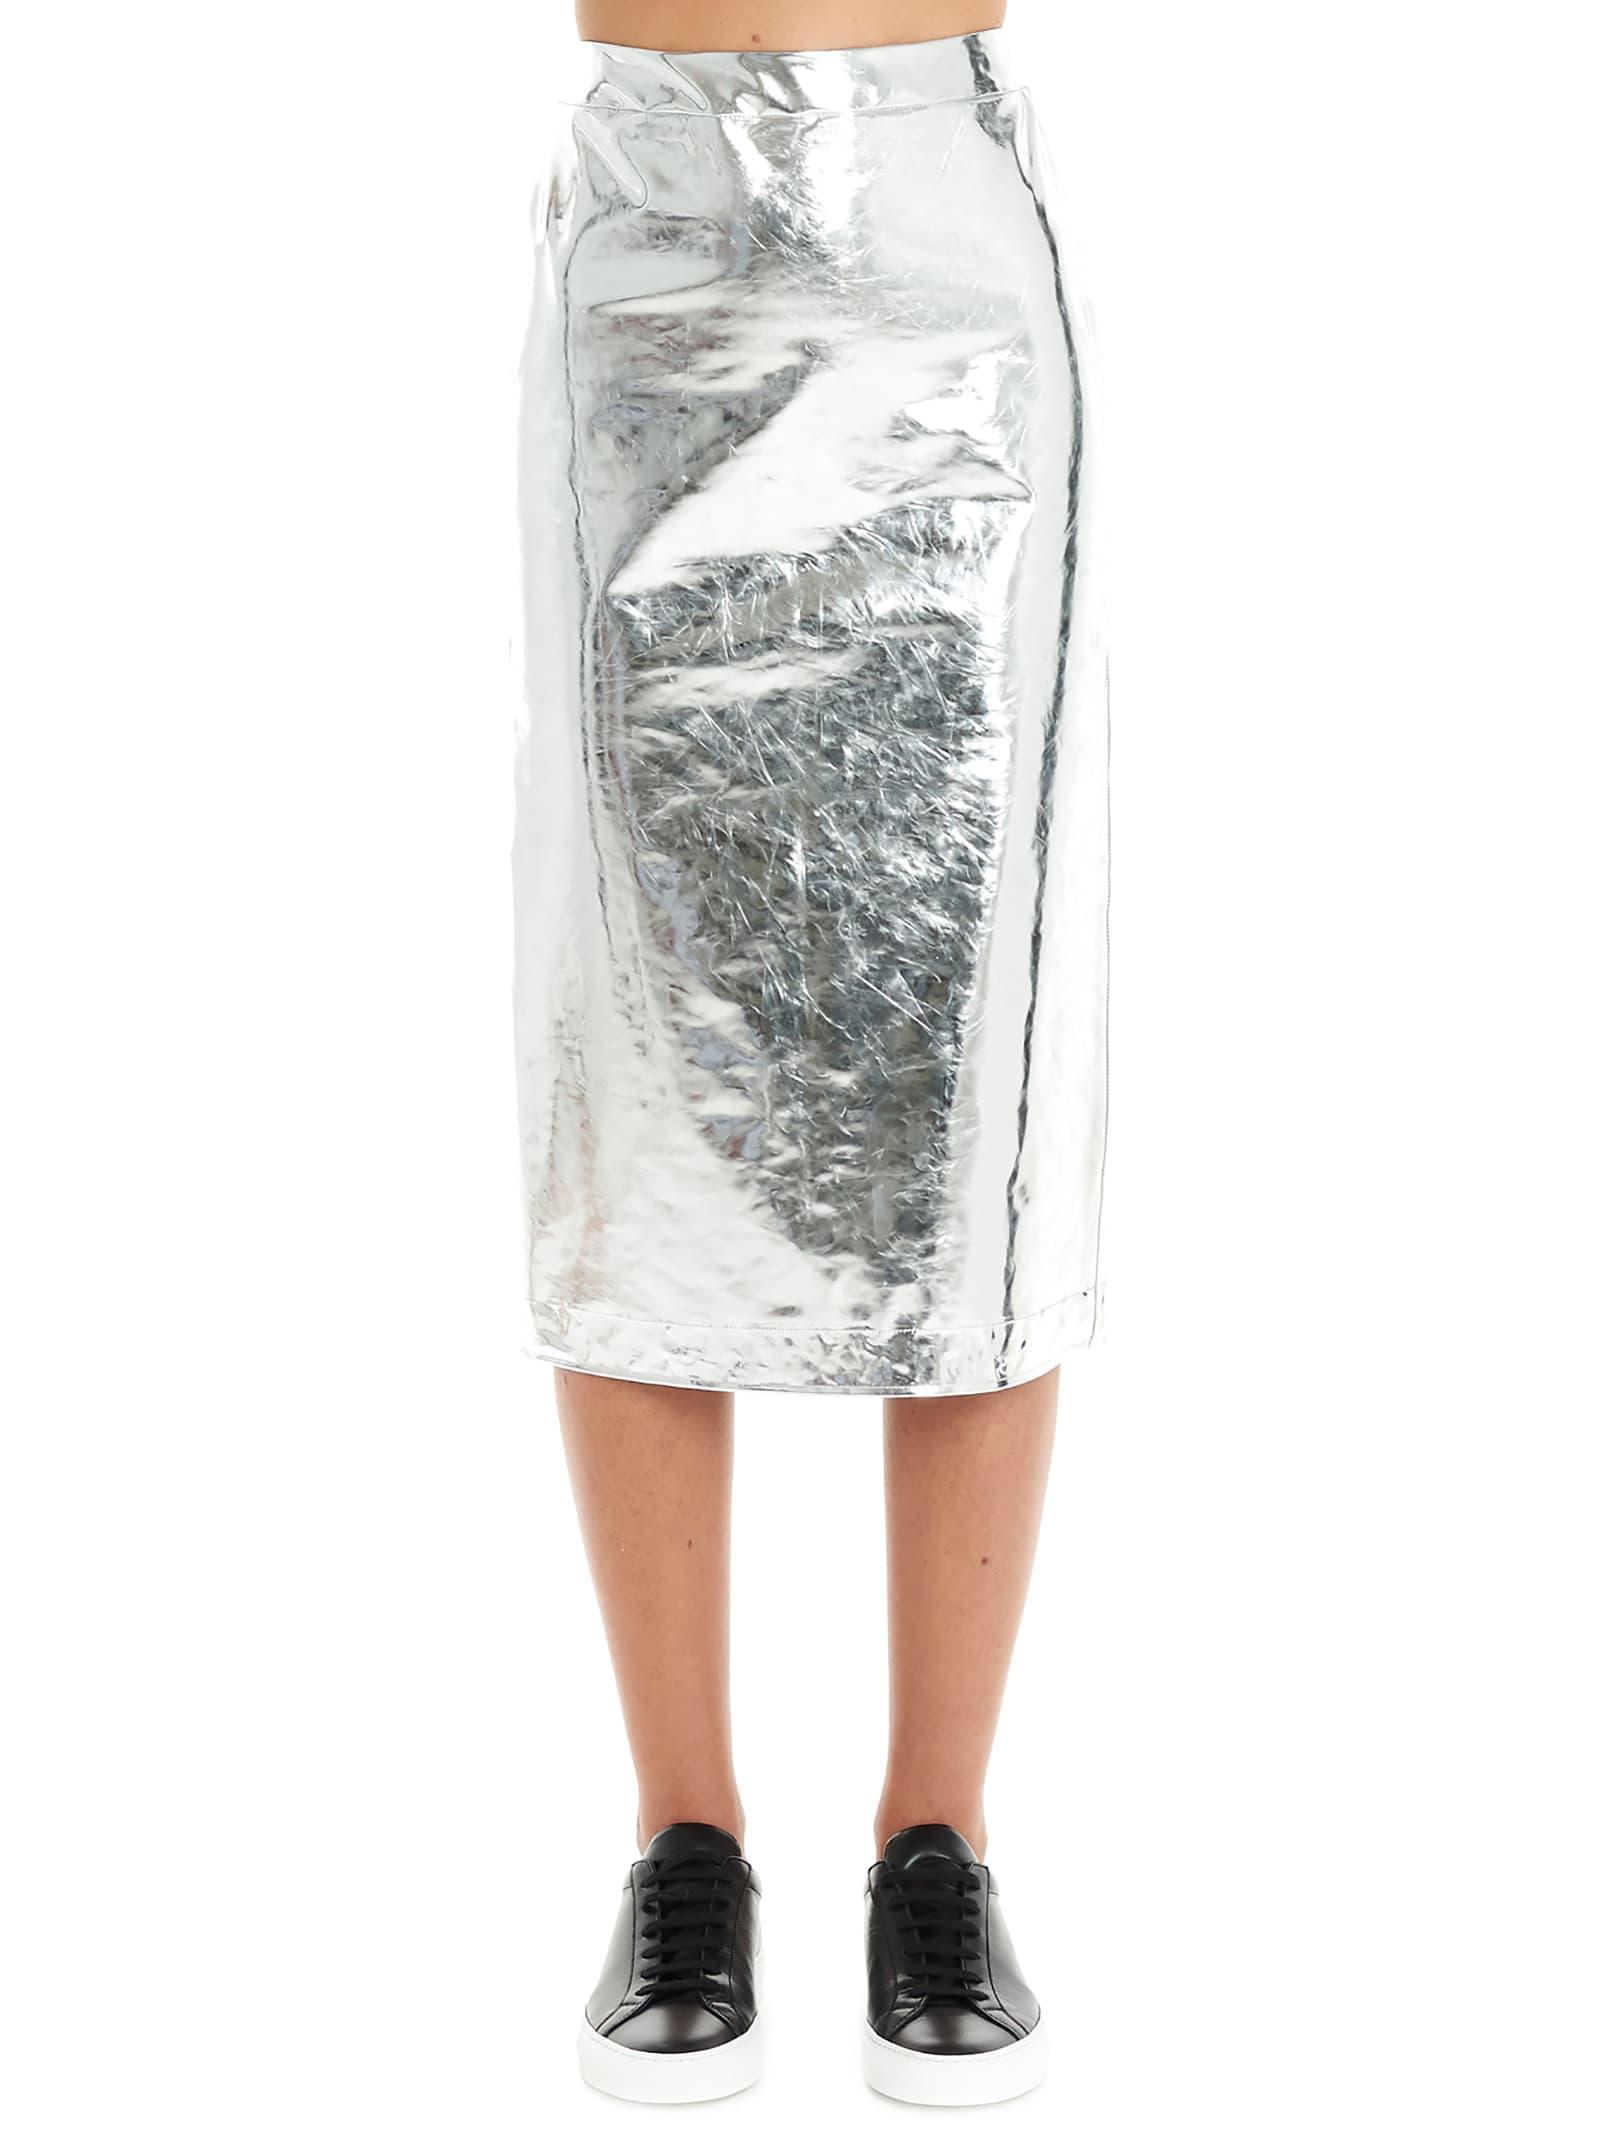 mirror Skirt